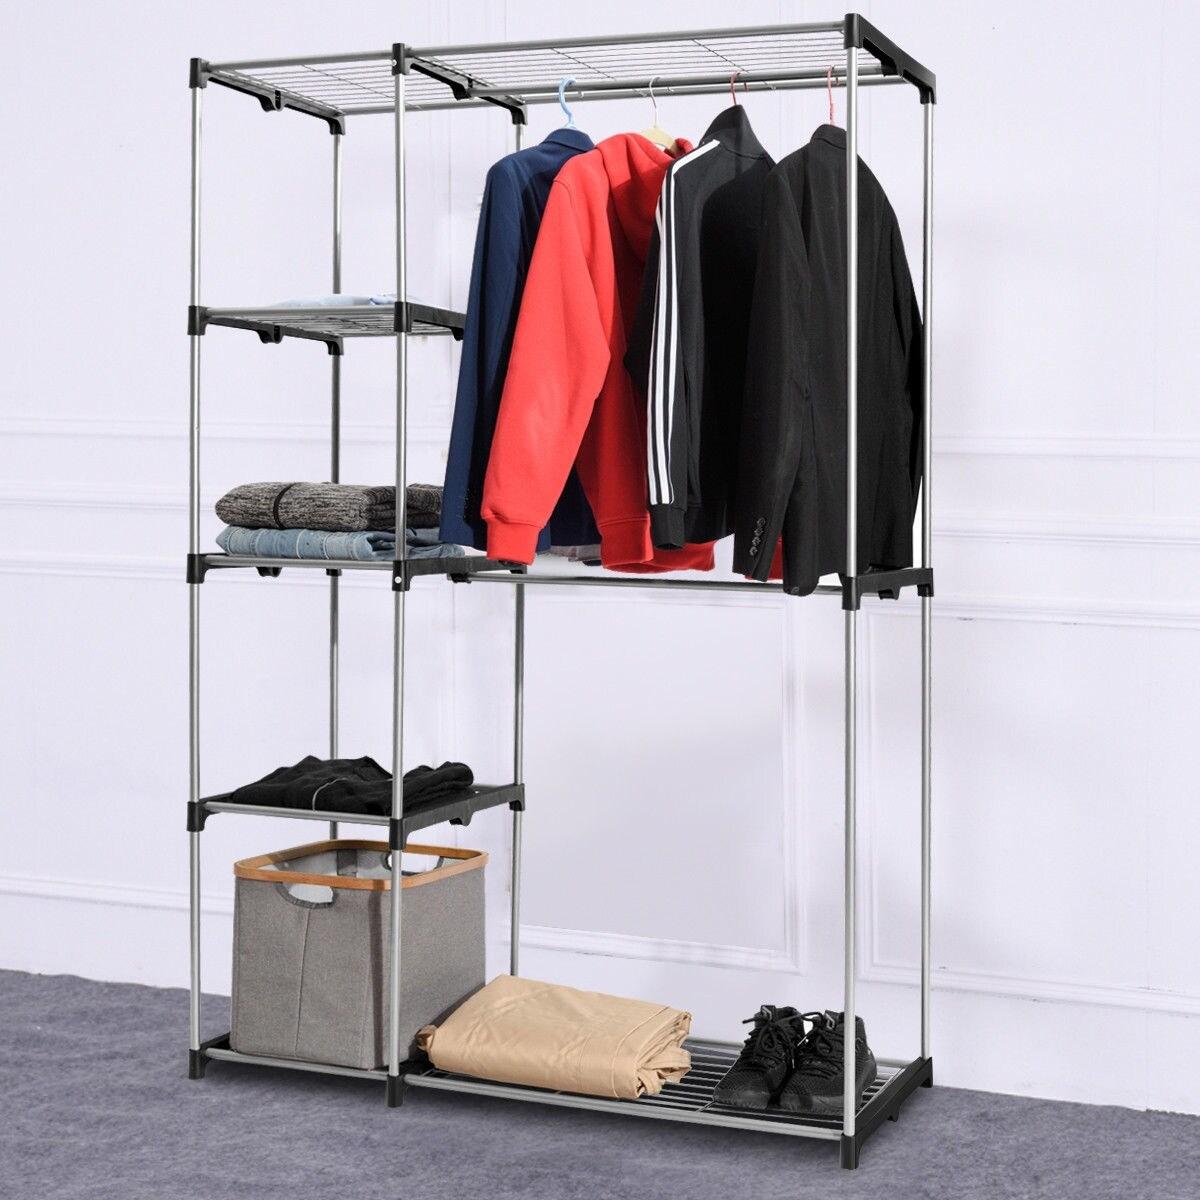 Portable Closet Organizer Storage Rack Clothes Hanger